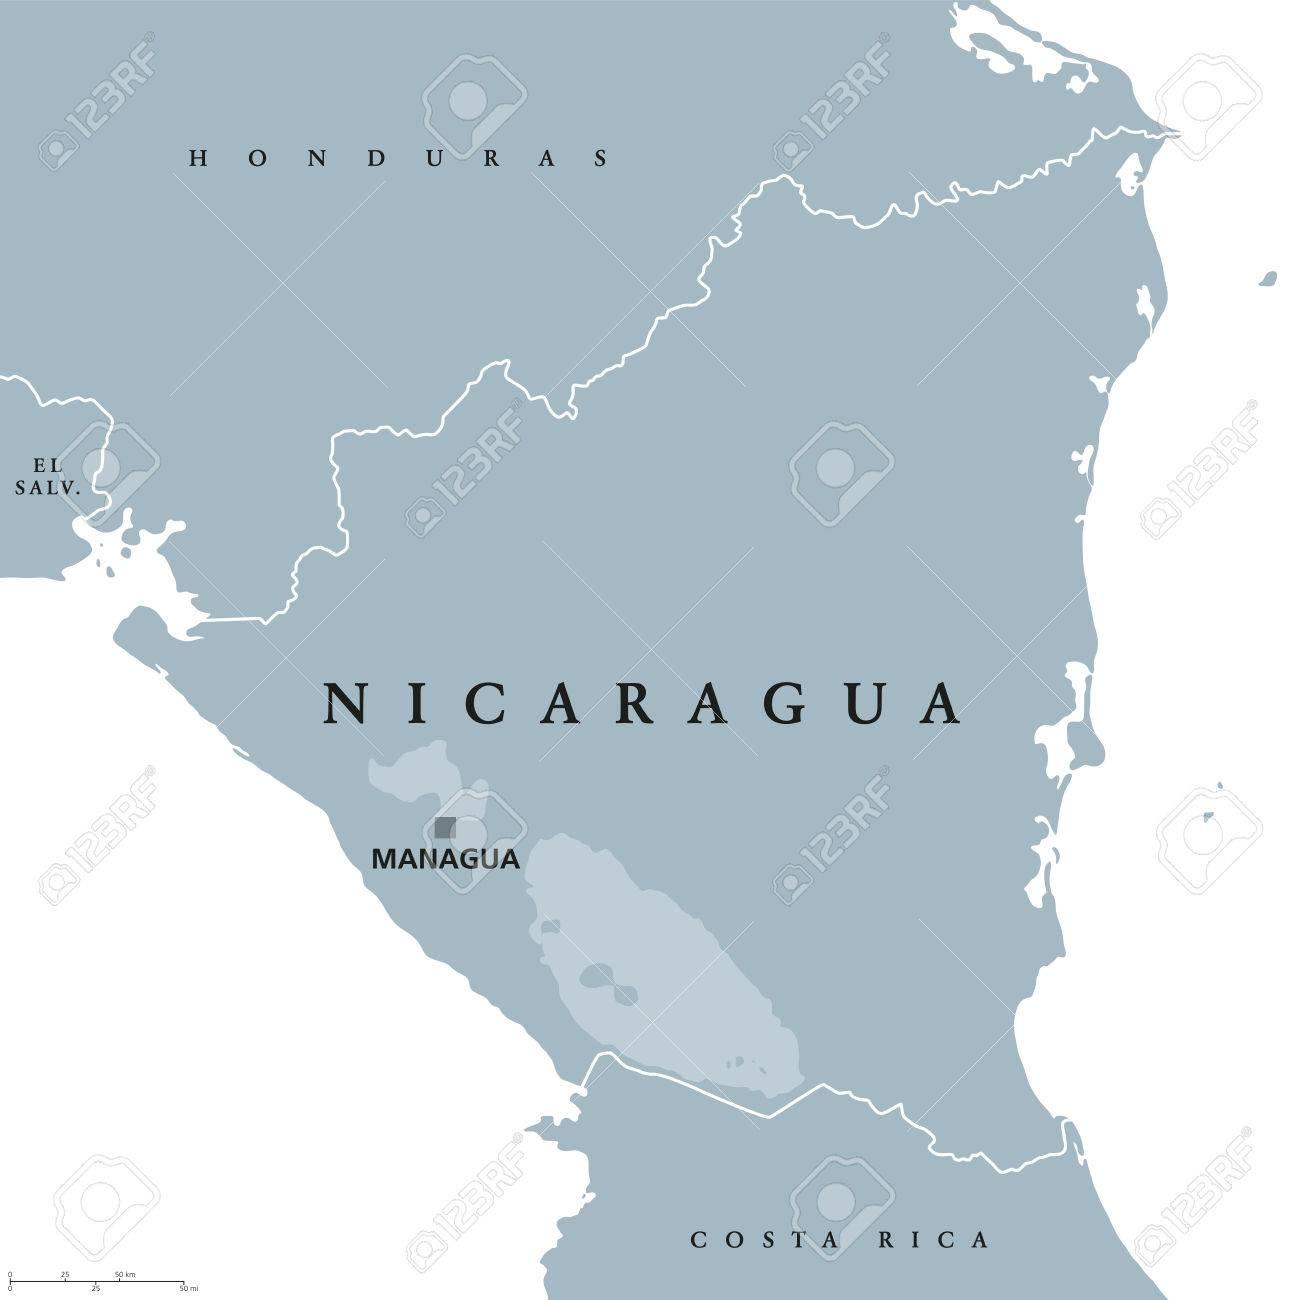 Nicaragua Political Map With Capital Managua National Borders - Honduras country political map